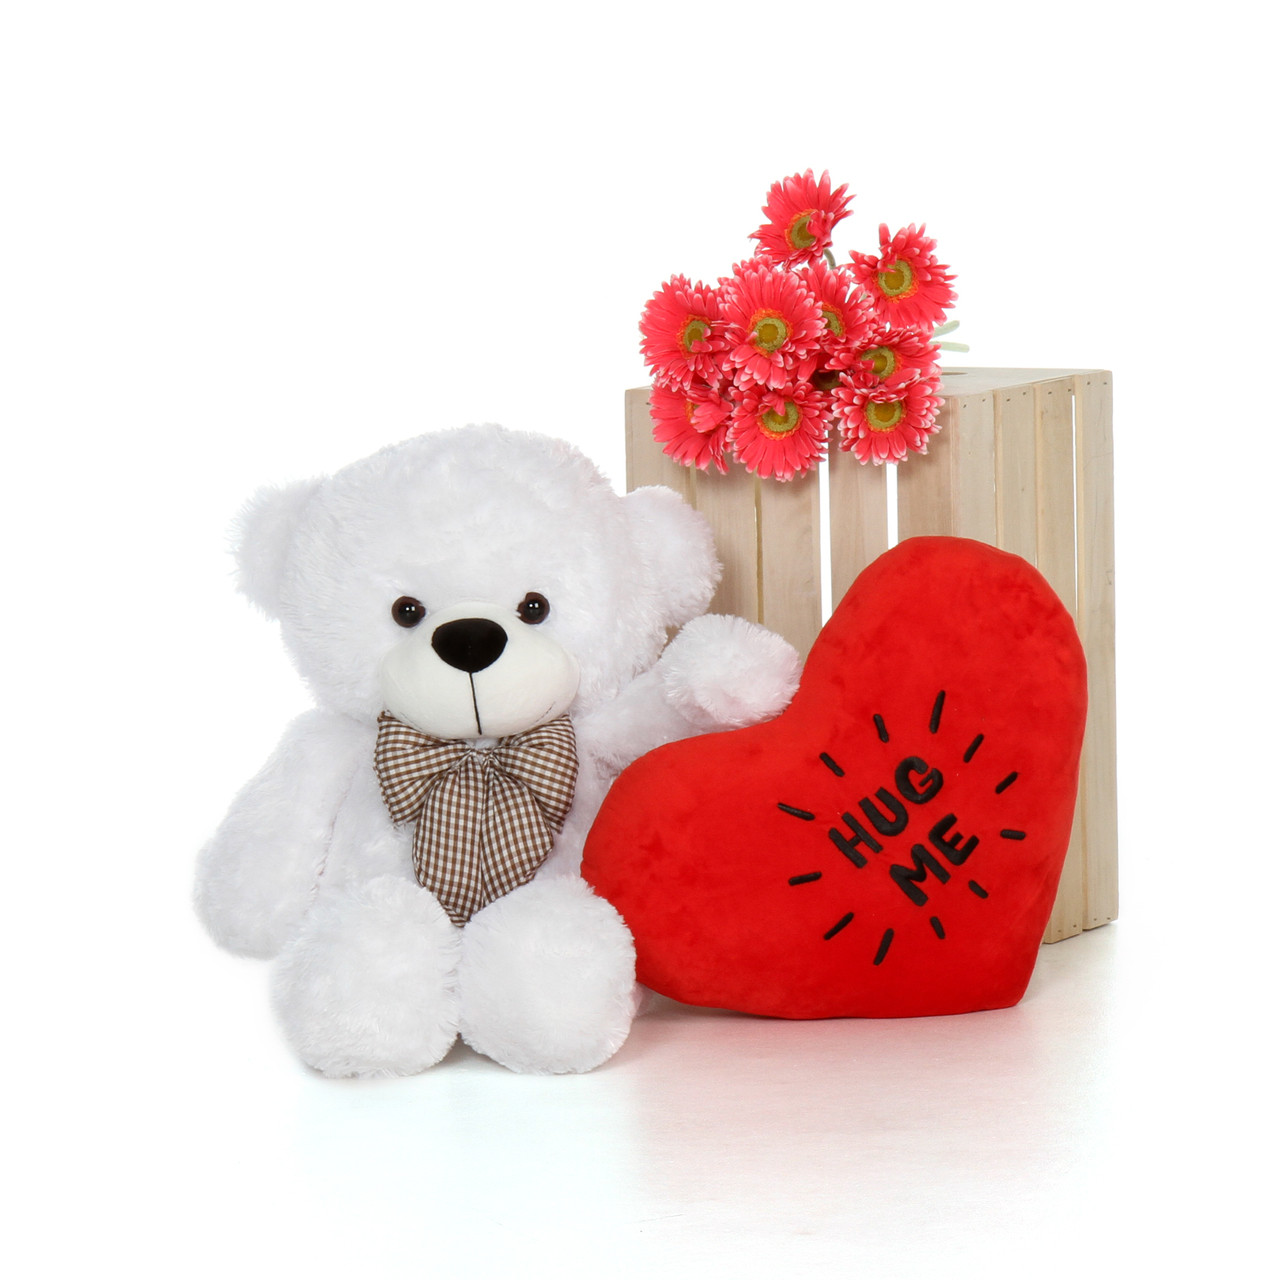 30in big valentines day teddy bear with beautiful hug me red 30in big valentines day teddy bear white coco cuddles with beautiful hug me red heart pillow izmirmasajfo